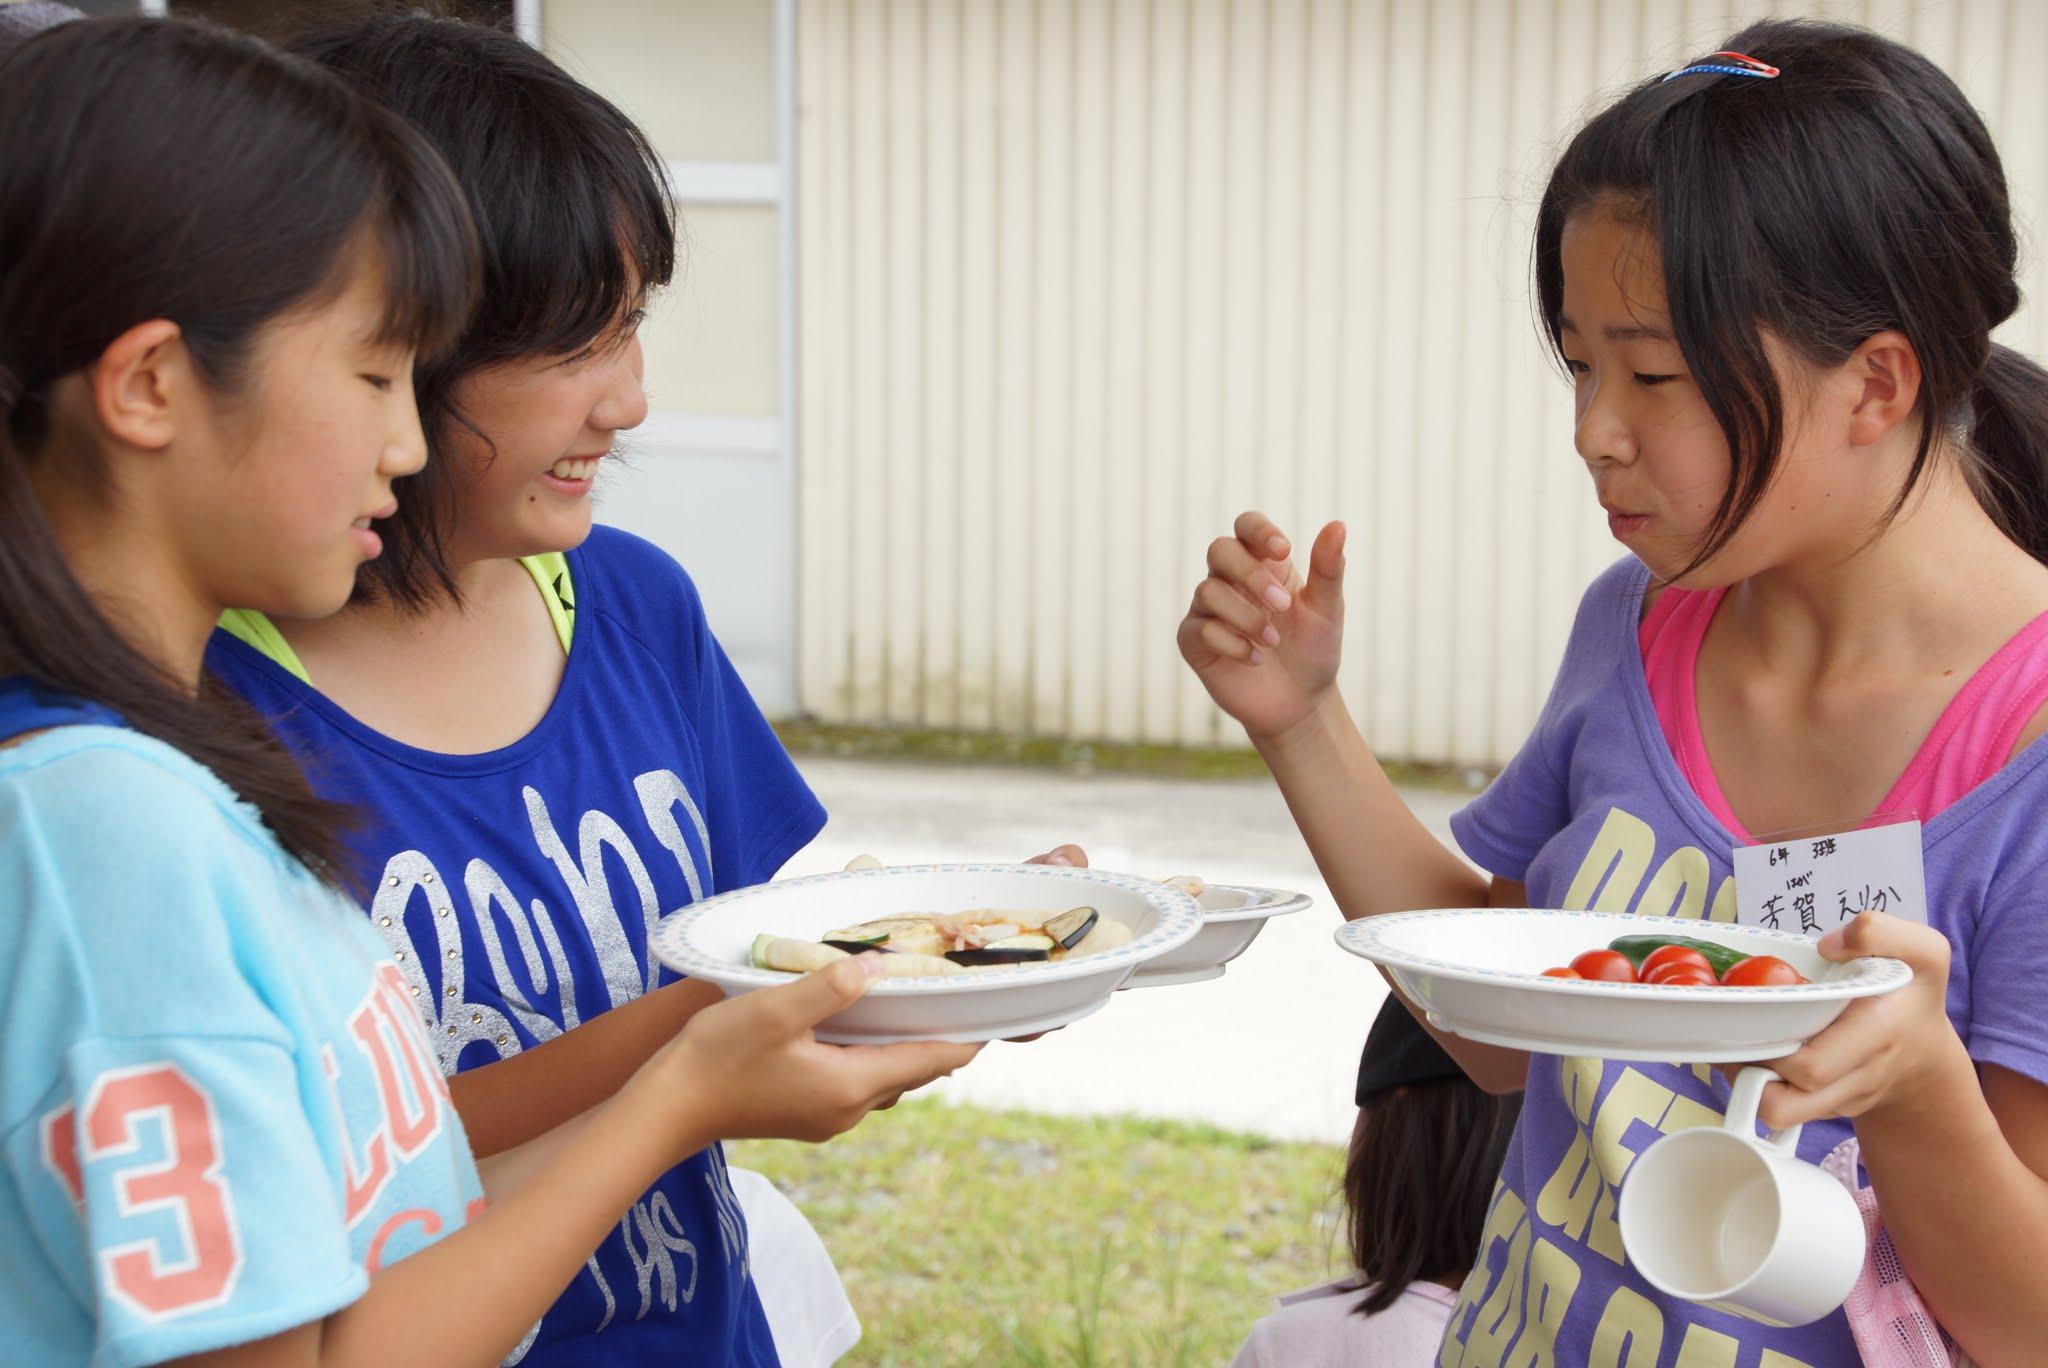 【JS】女子小学生 高学年画像スレPart4【JS】YouTube動画>11本 ニコニコ動画>4本 ->画像>517枚